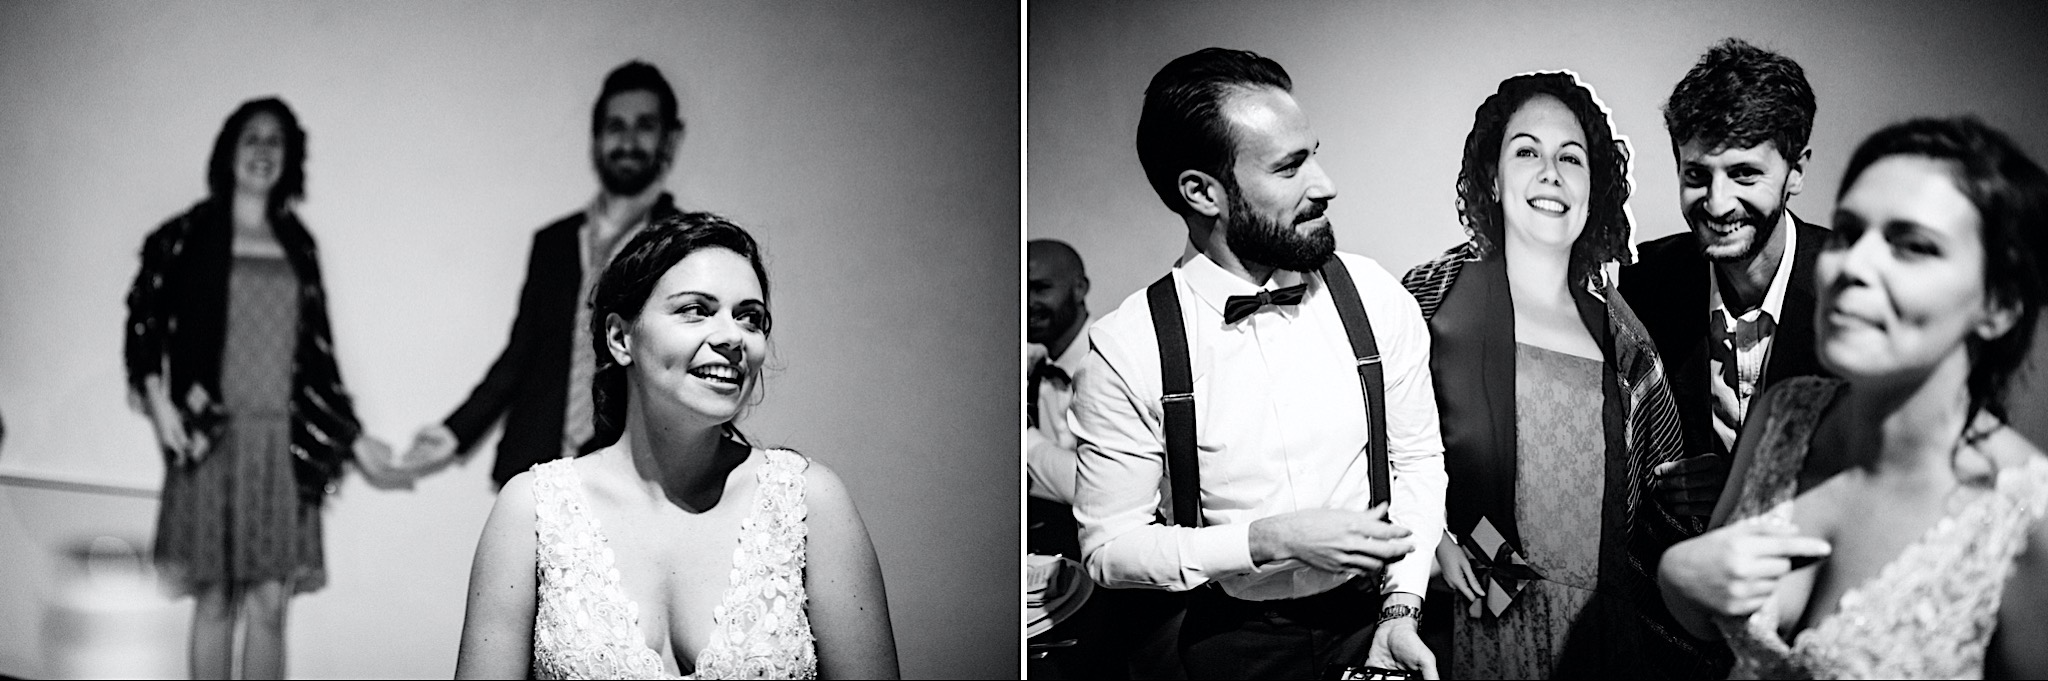 fotografo-matrimonio-villa-papafava-frassanelle-59